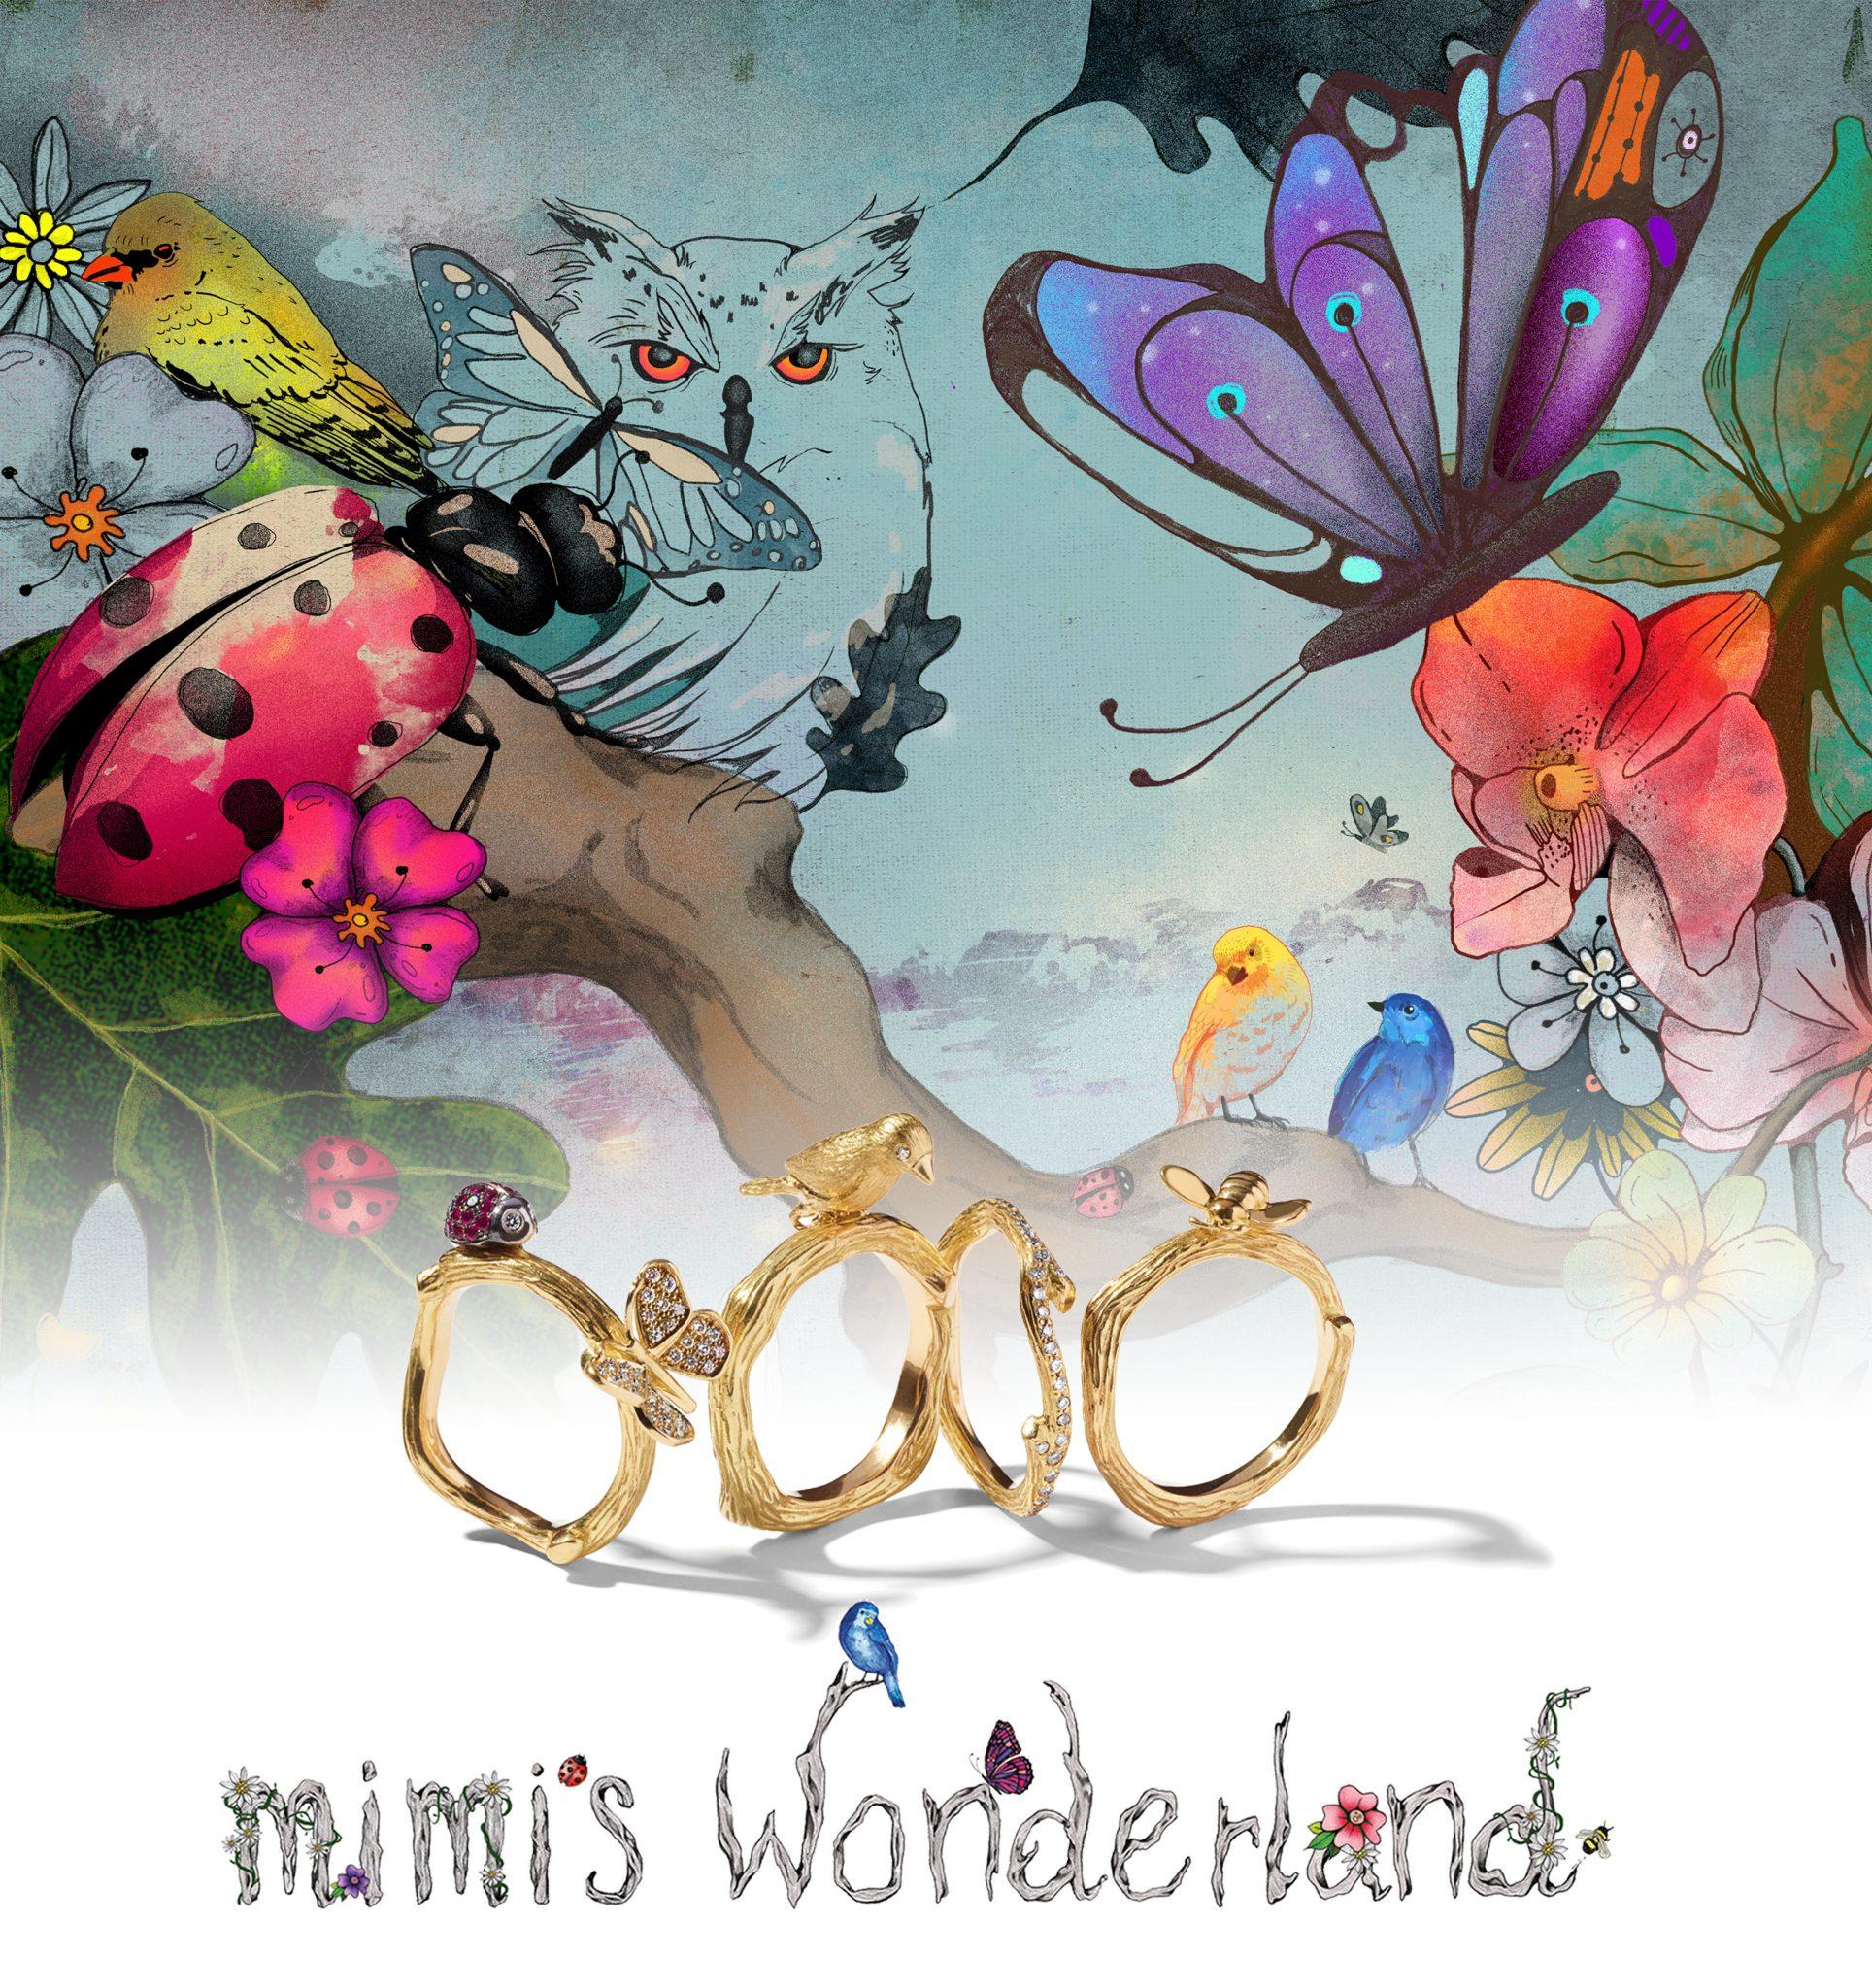 Wonderland Four seasons ad copy